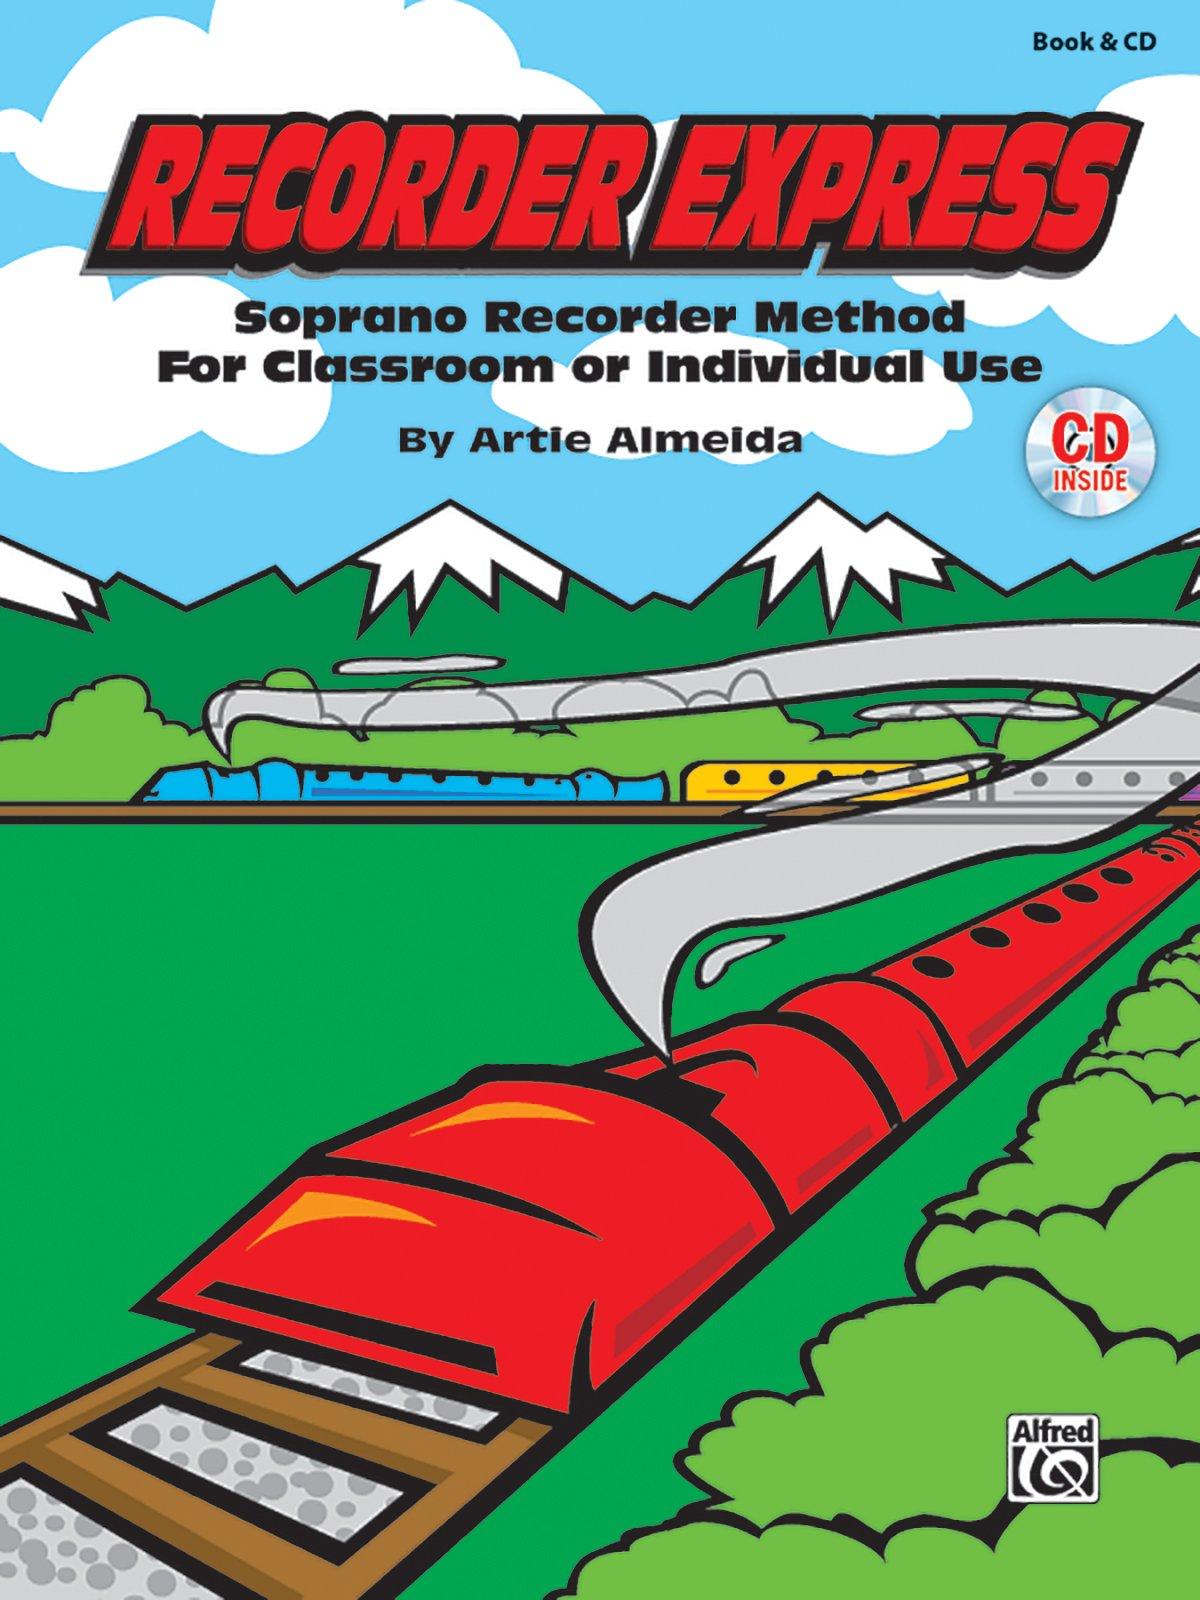 Download Recorder Express (Soprano Recorder Method for Classroom or Individual Use): Soprano Recorder Method for Classroom or Individual Use, Book & CD pdf